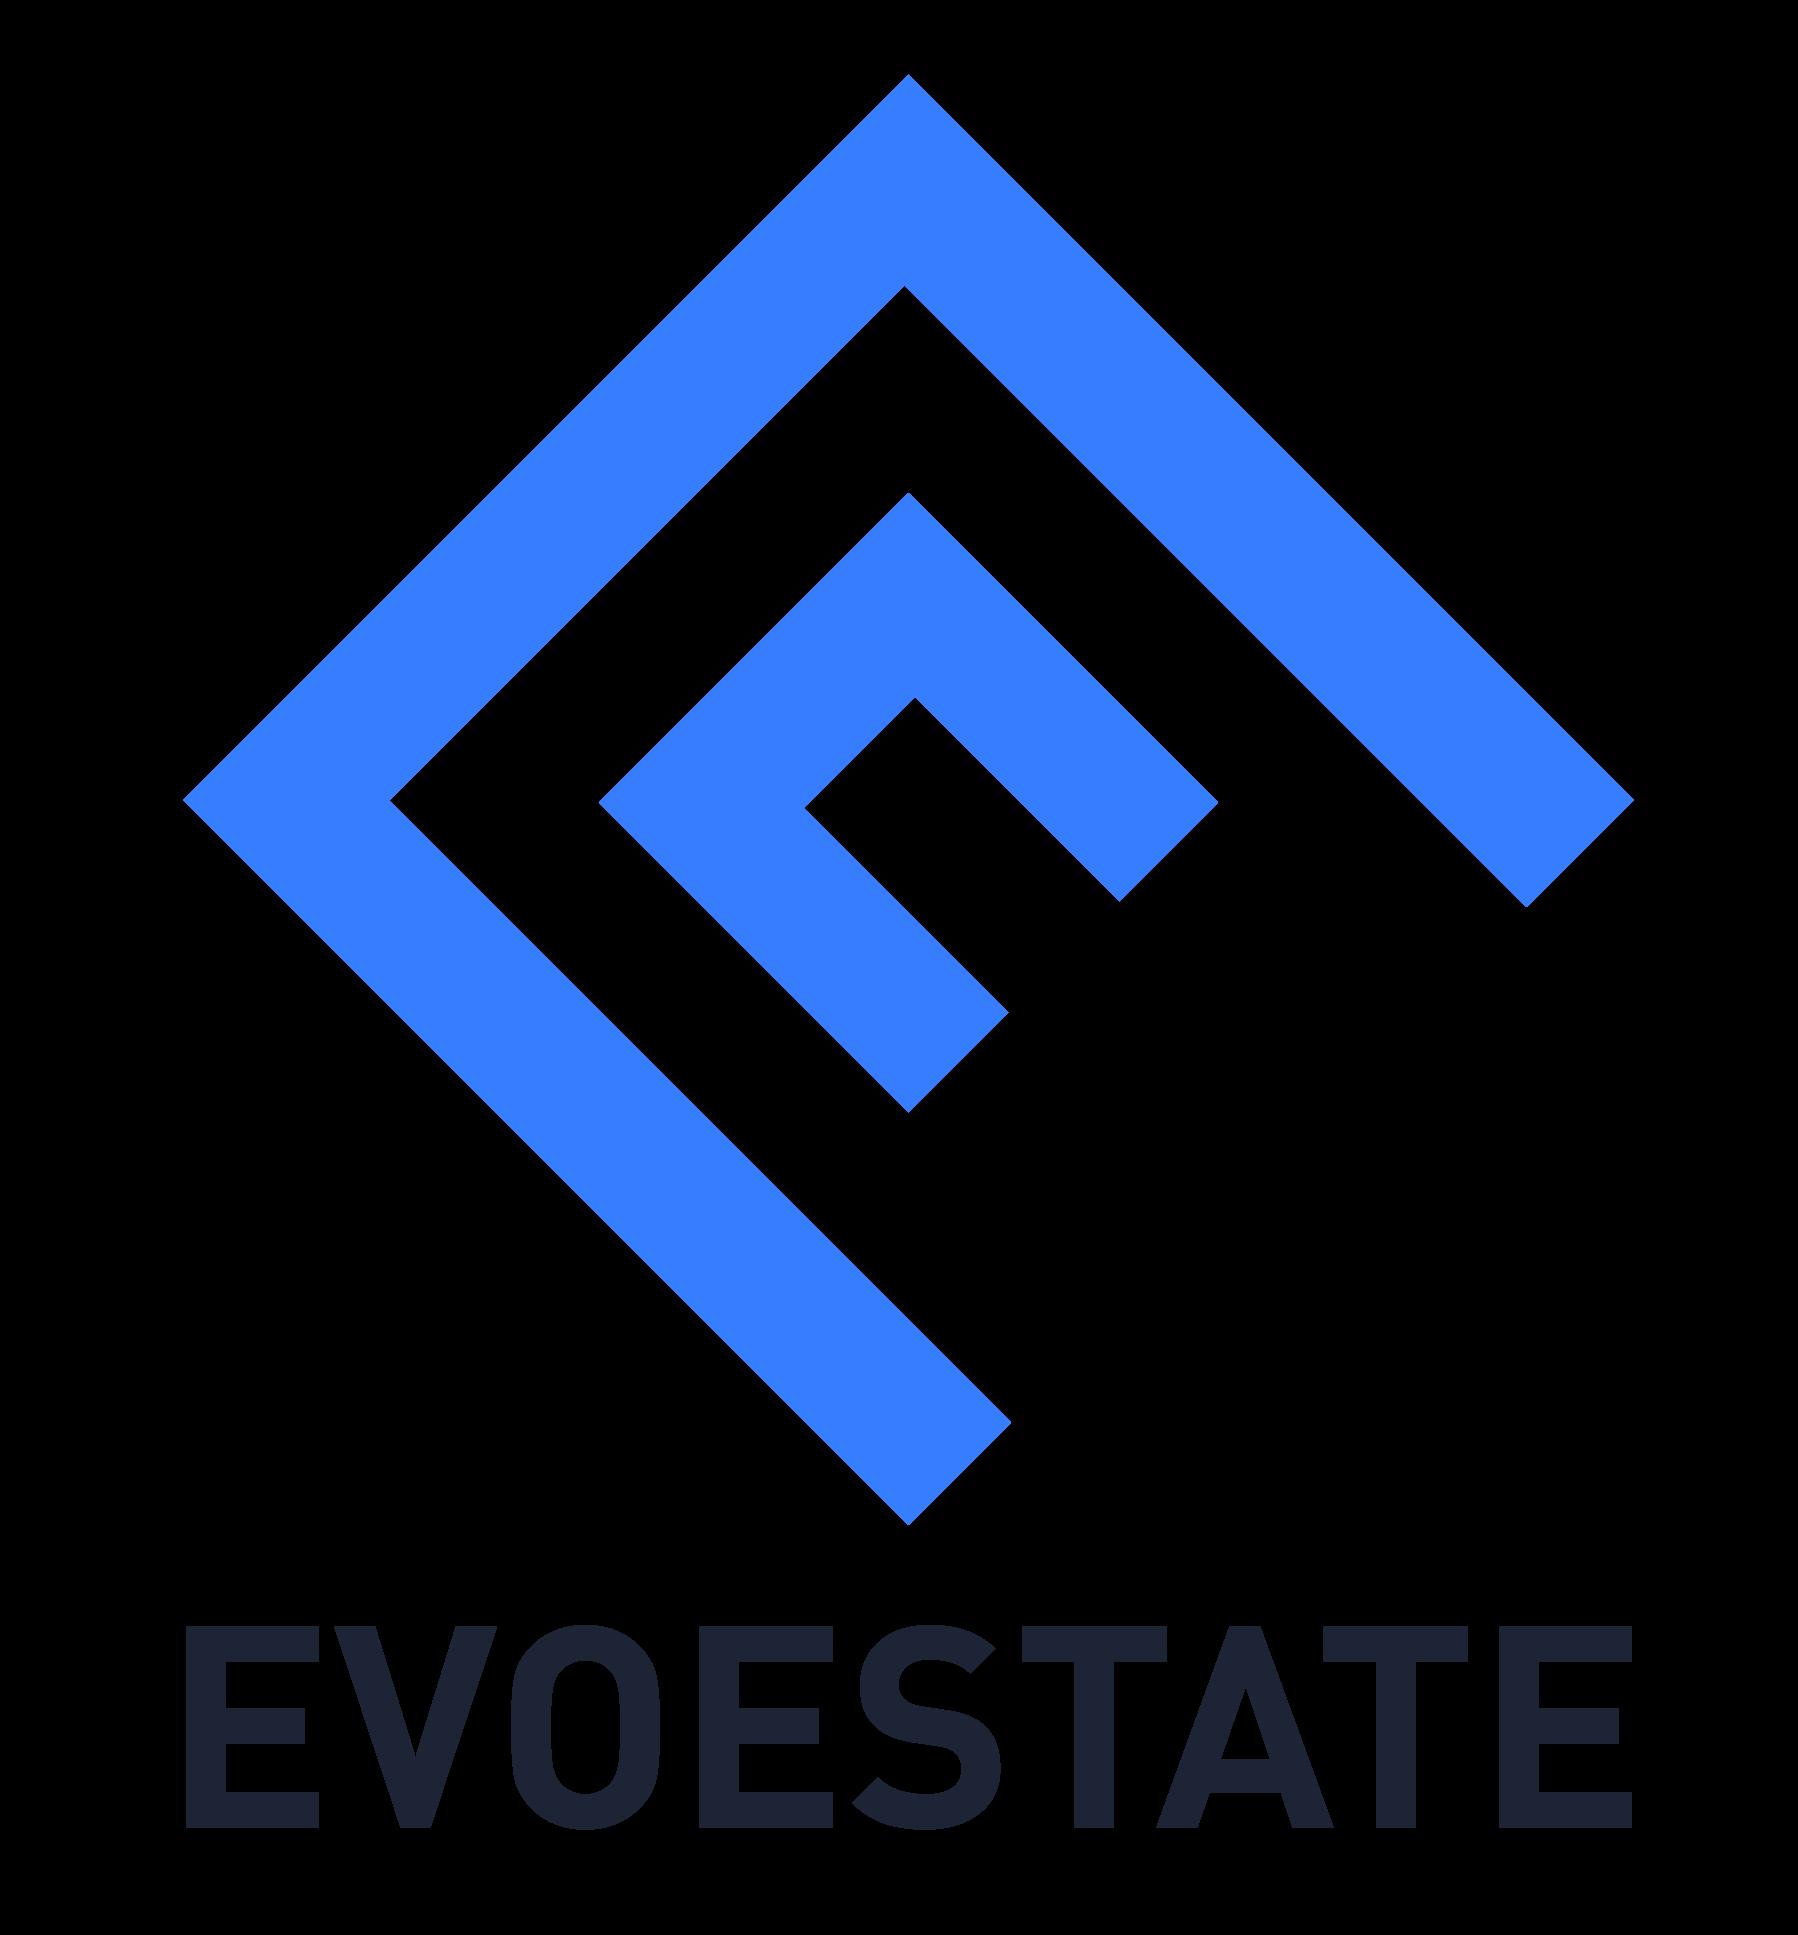 EvoEstate's logo